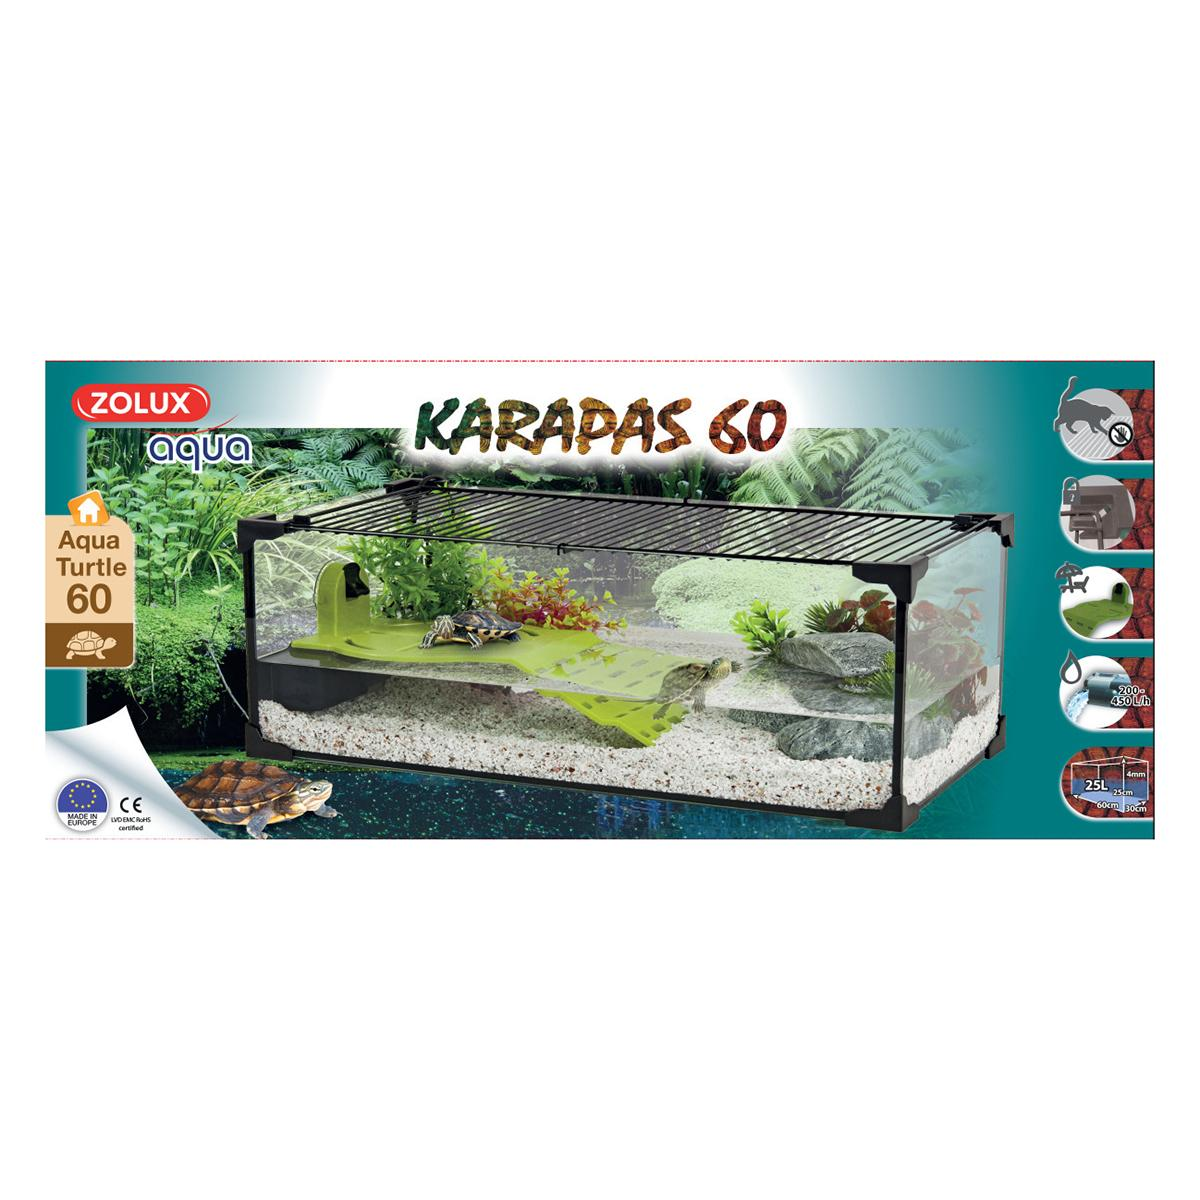 Tartarughiera Karapas Aqua Bianca 60 Cm